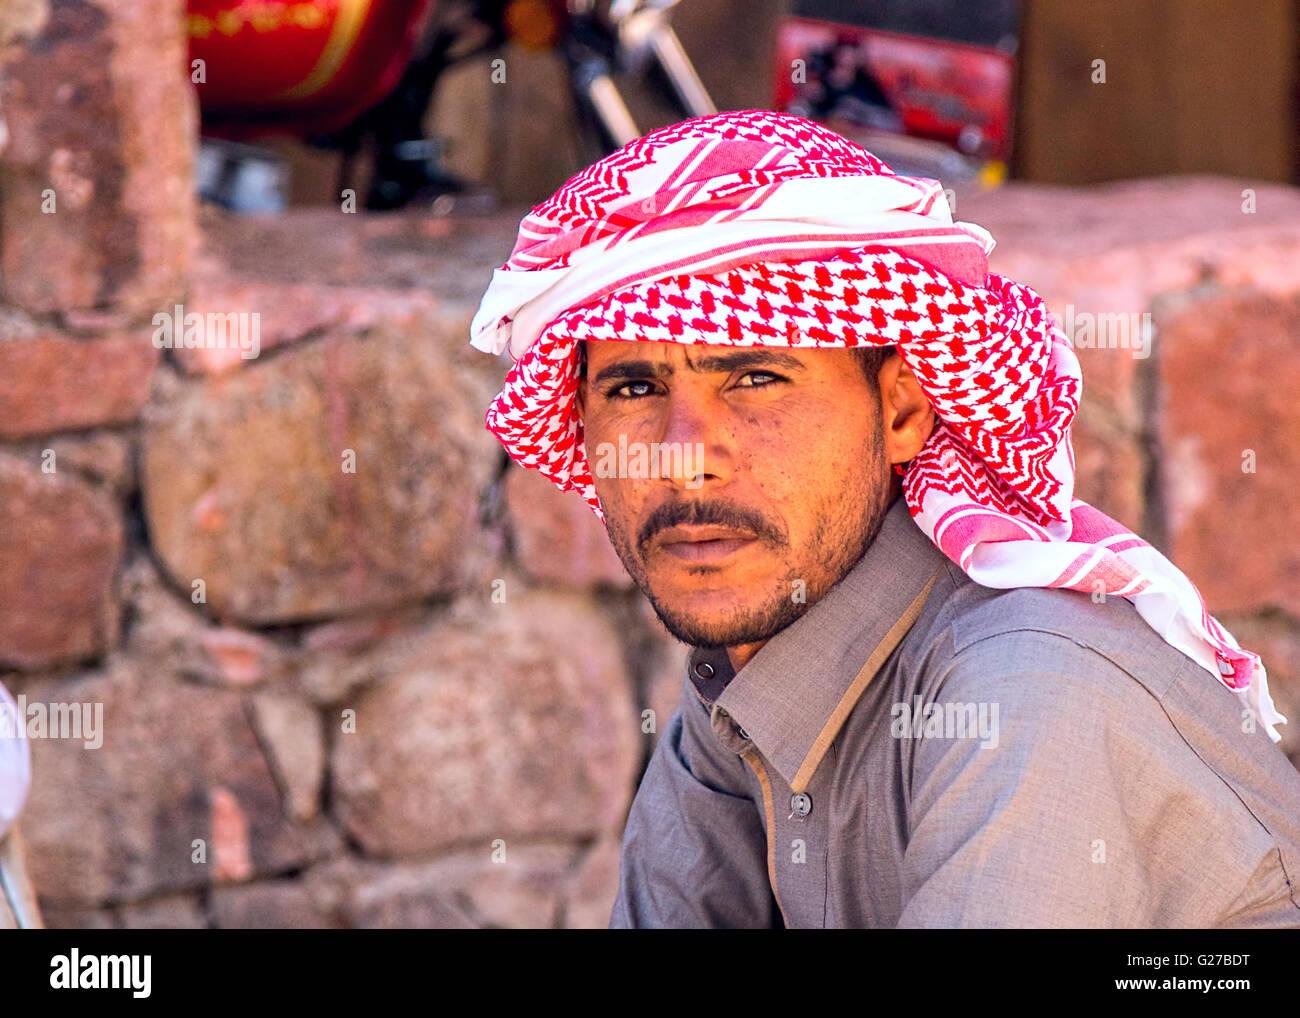 Mens Arab Sheik- Tunic Headdress White Arab Outfit